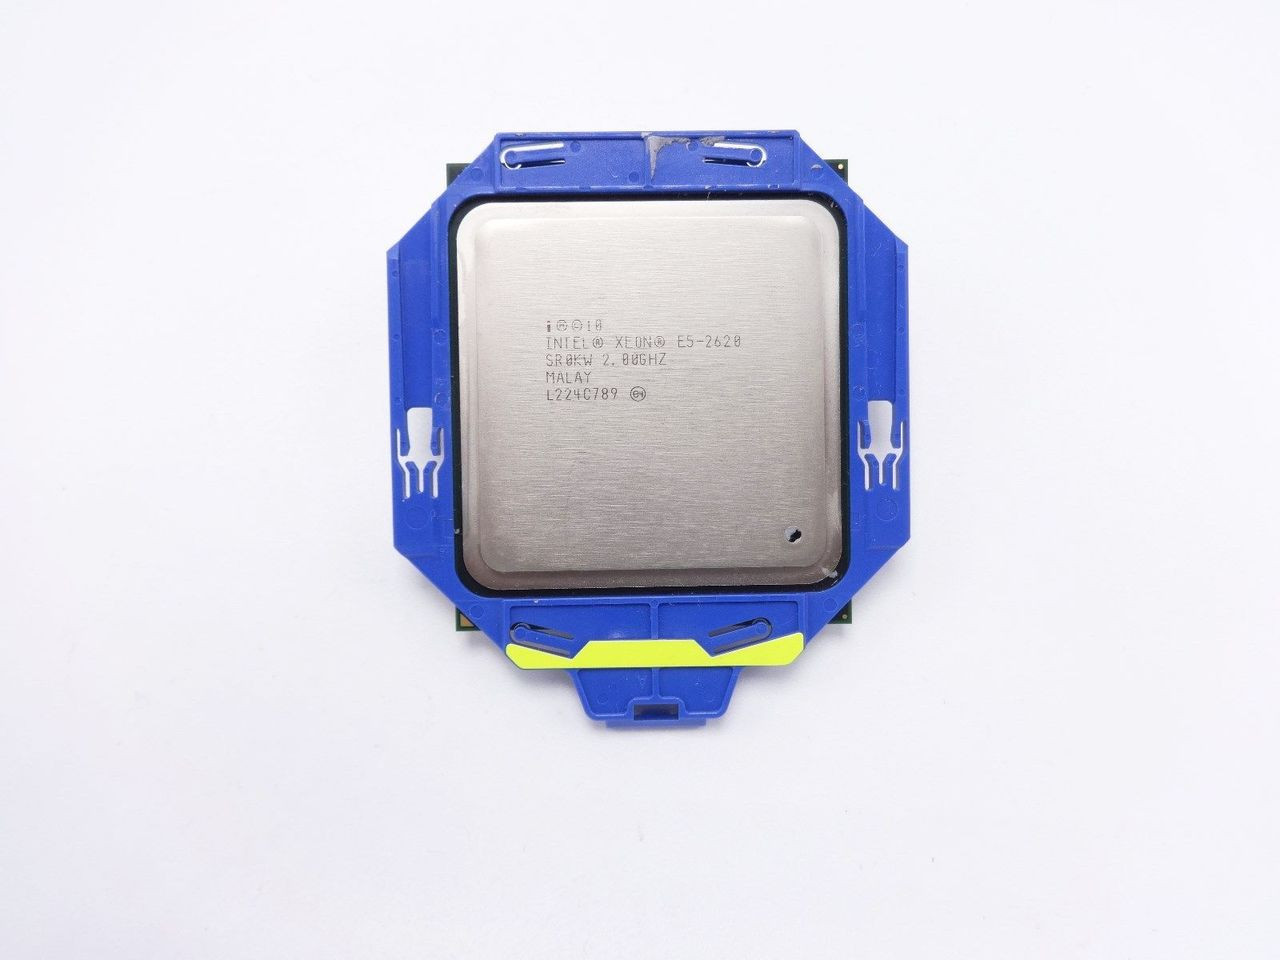 INTEL SR0KW 2.00GHZ 15MB 6C 92W E5-2620 Processor